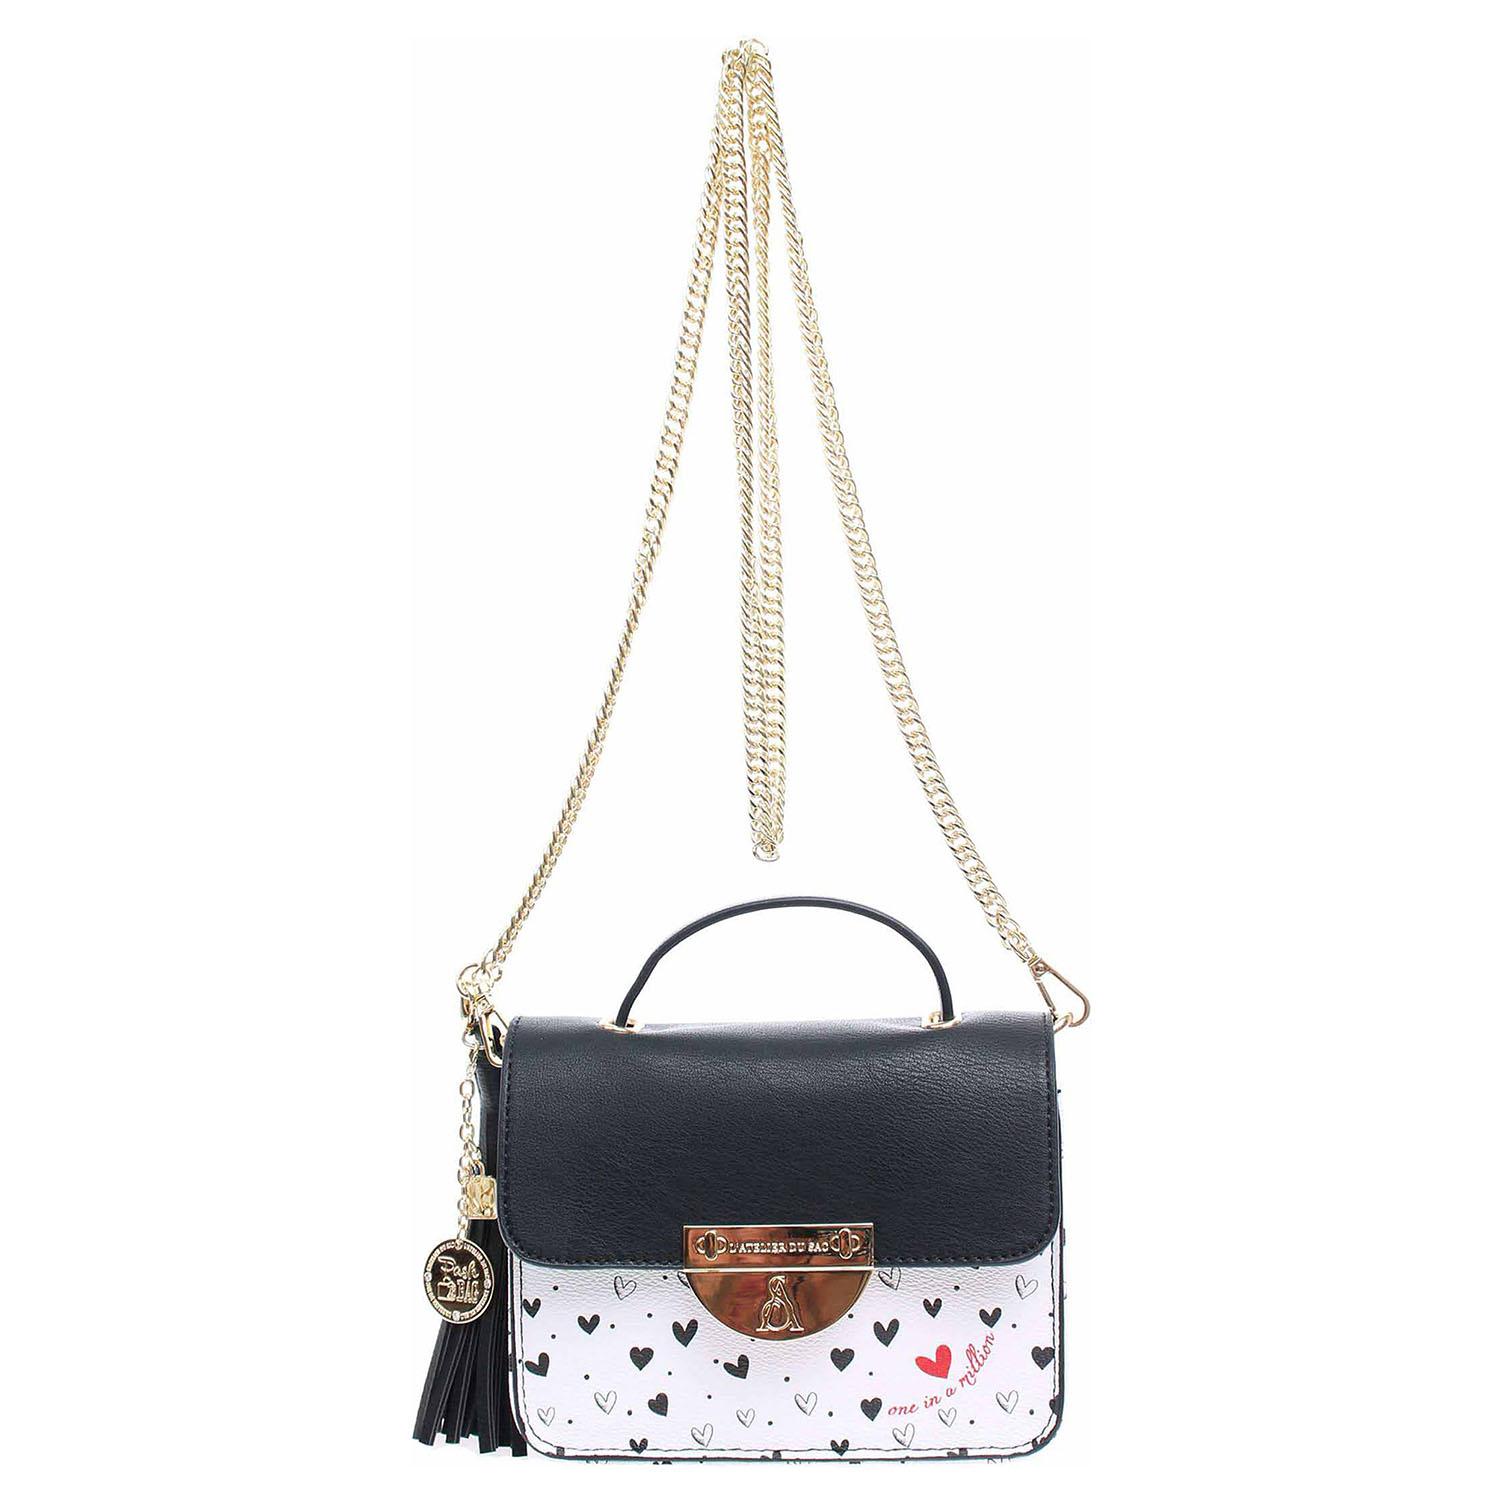 L'Atelier du Sac dámská kabelka 8576 černá-bílá 8576 černá/bílá 1